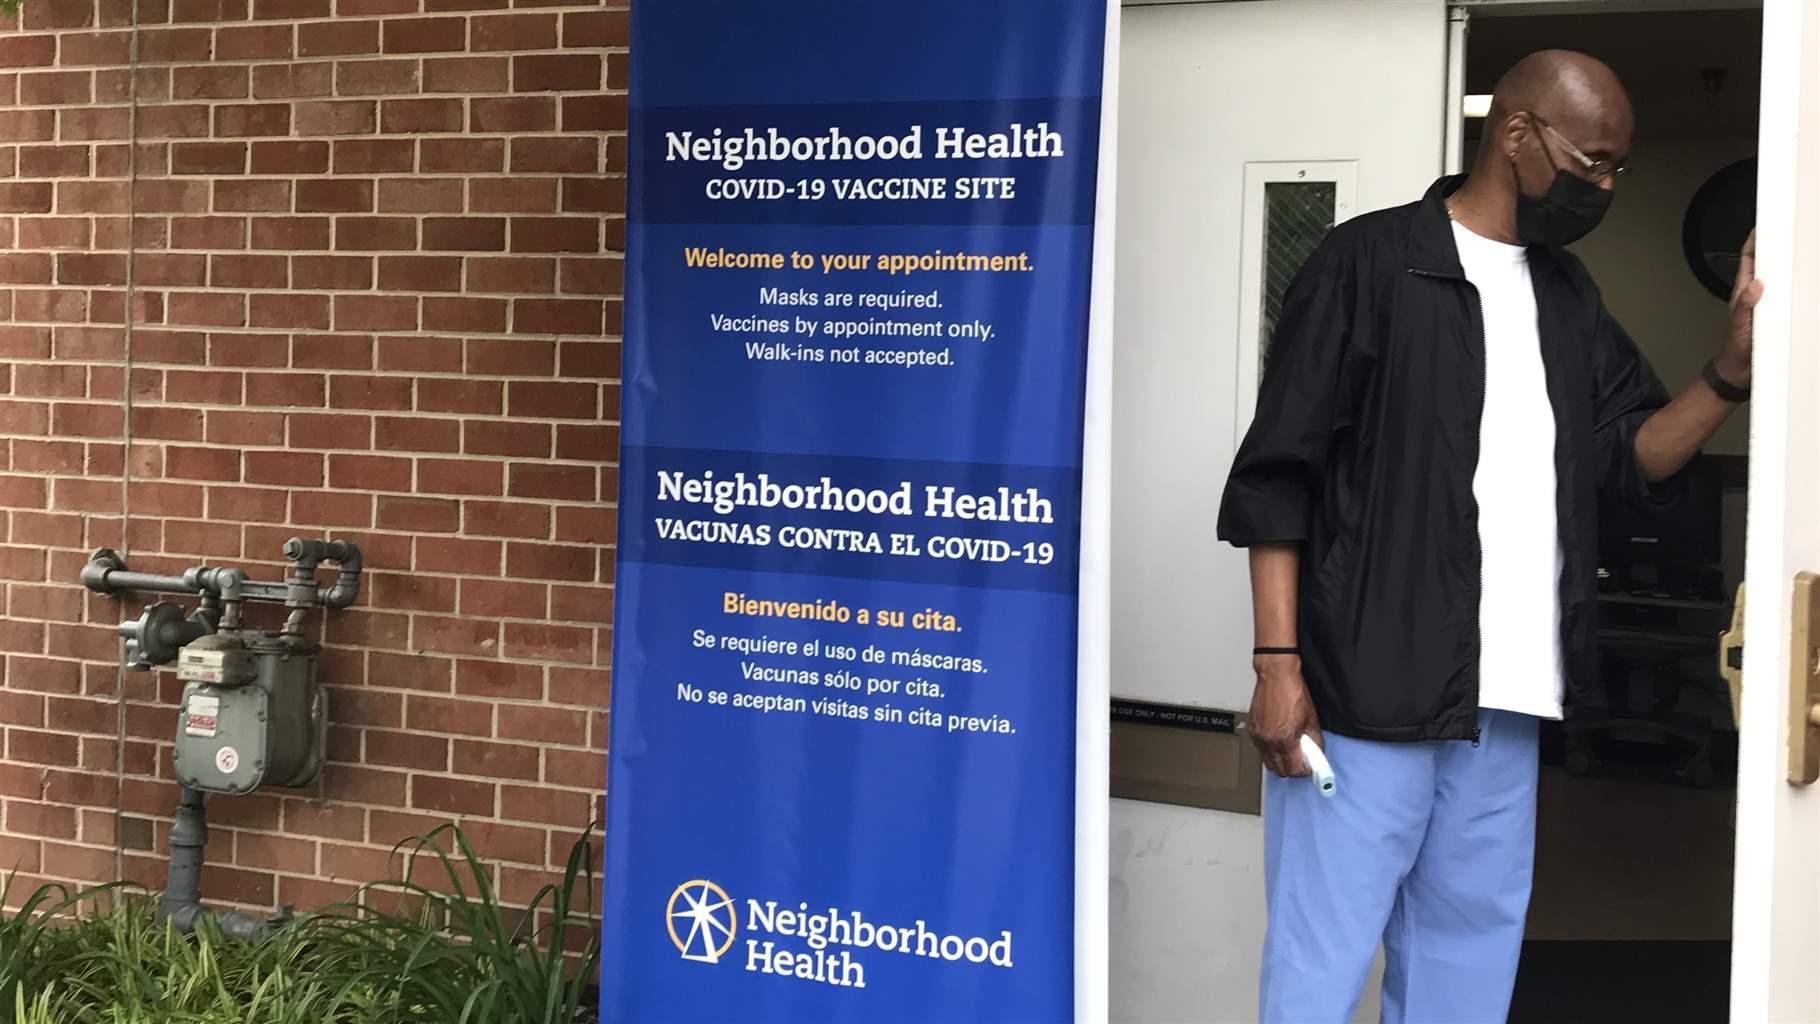 Neighborhood Health vaccination clinic